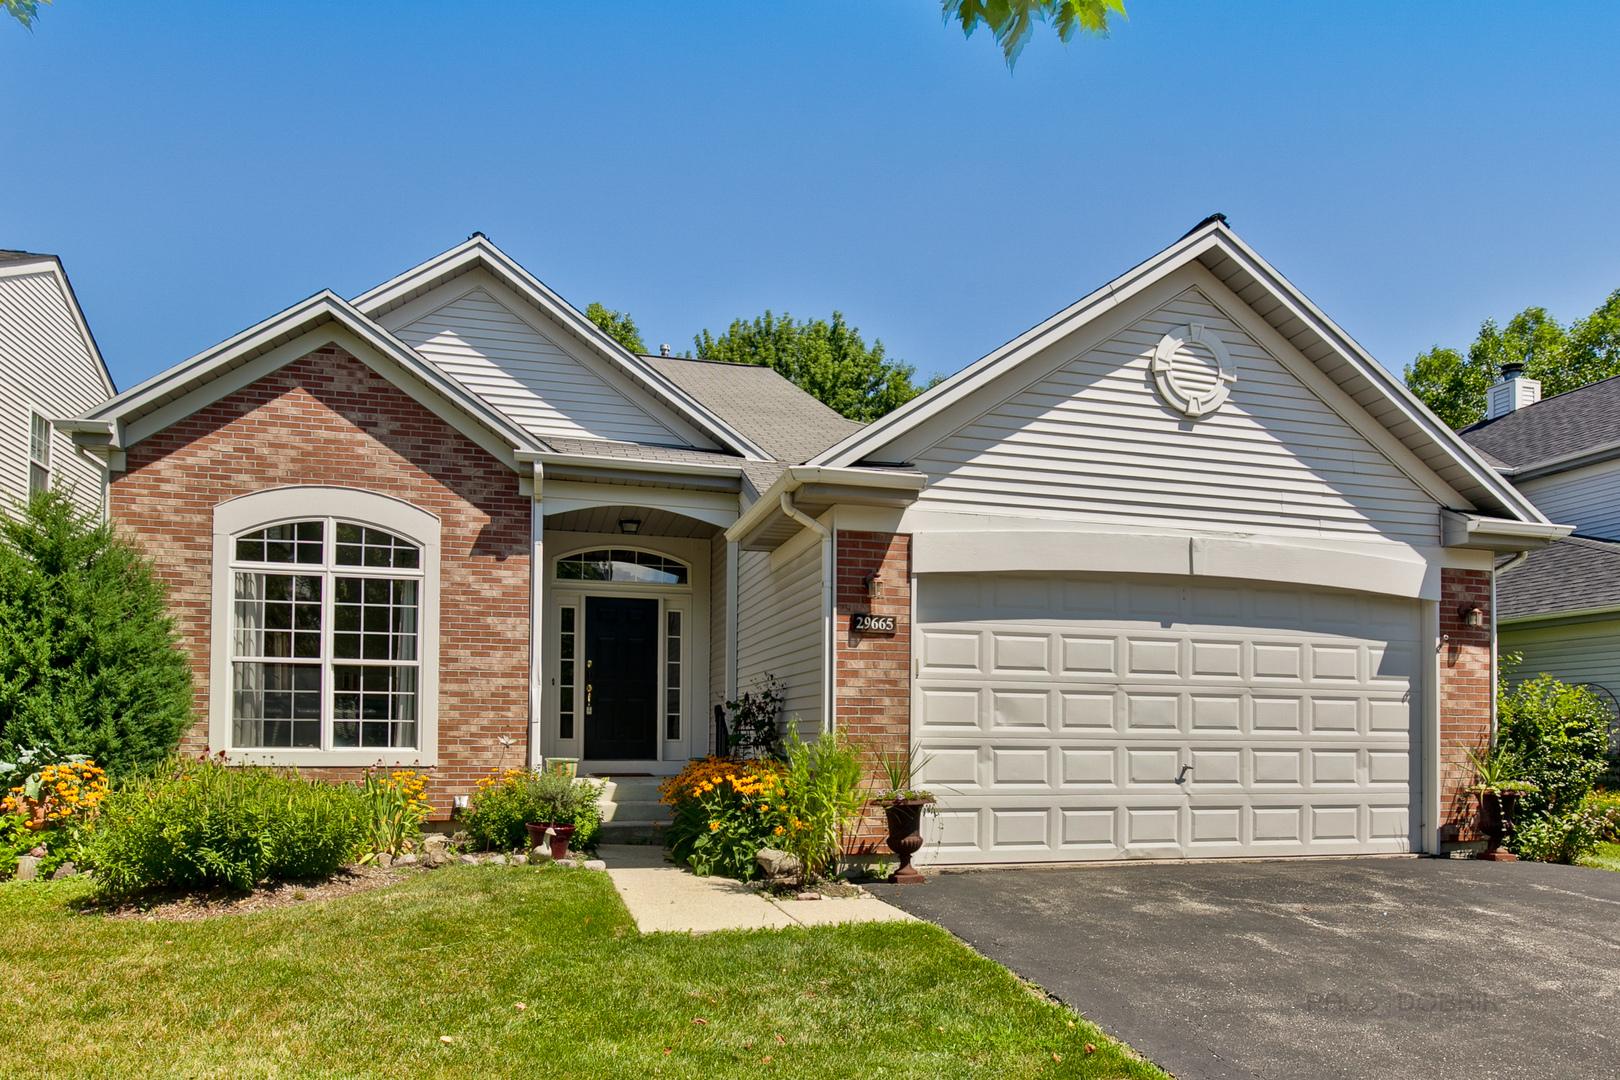 29665 North Environ Circle, Lake Bluff, Illinois 60044